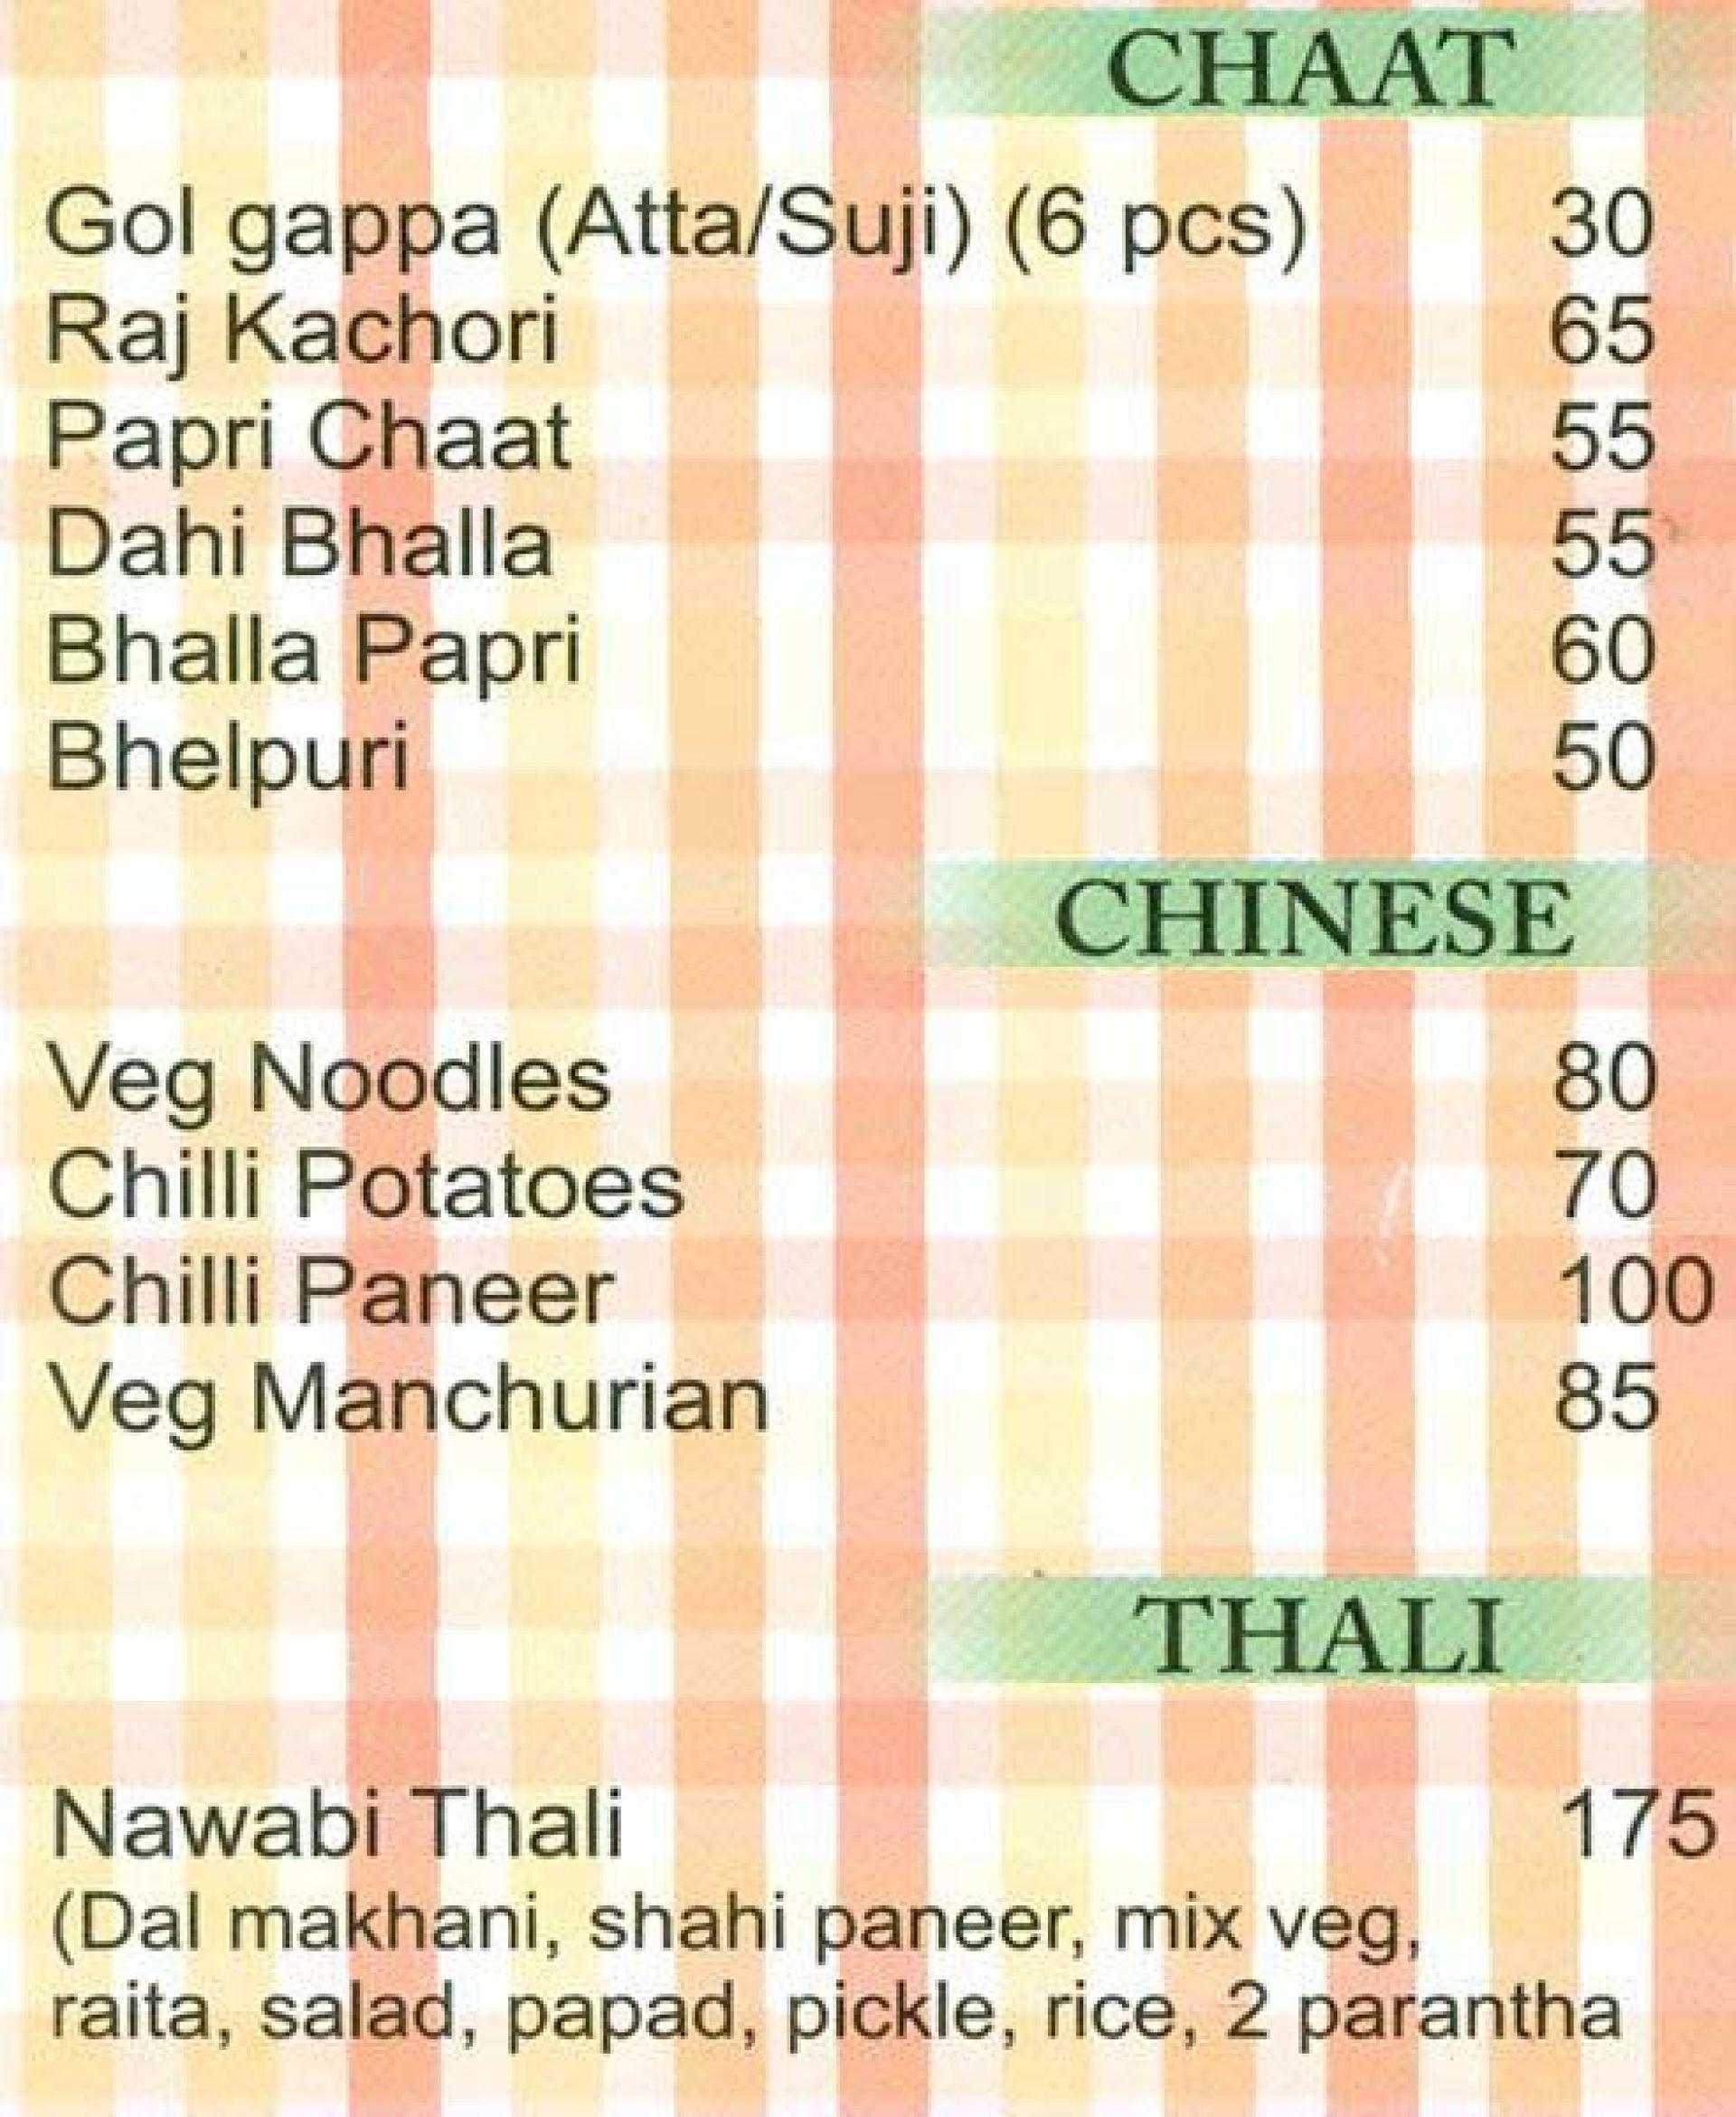 Menu of the Kanwarji's